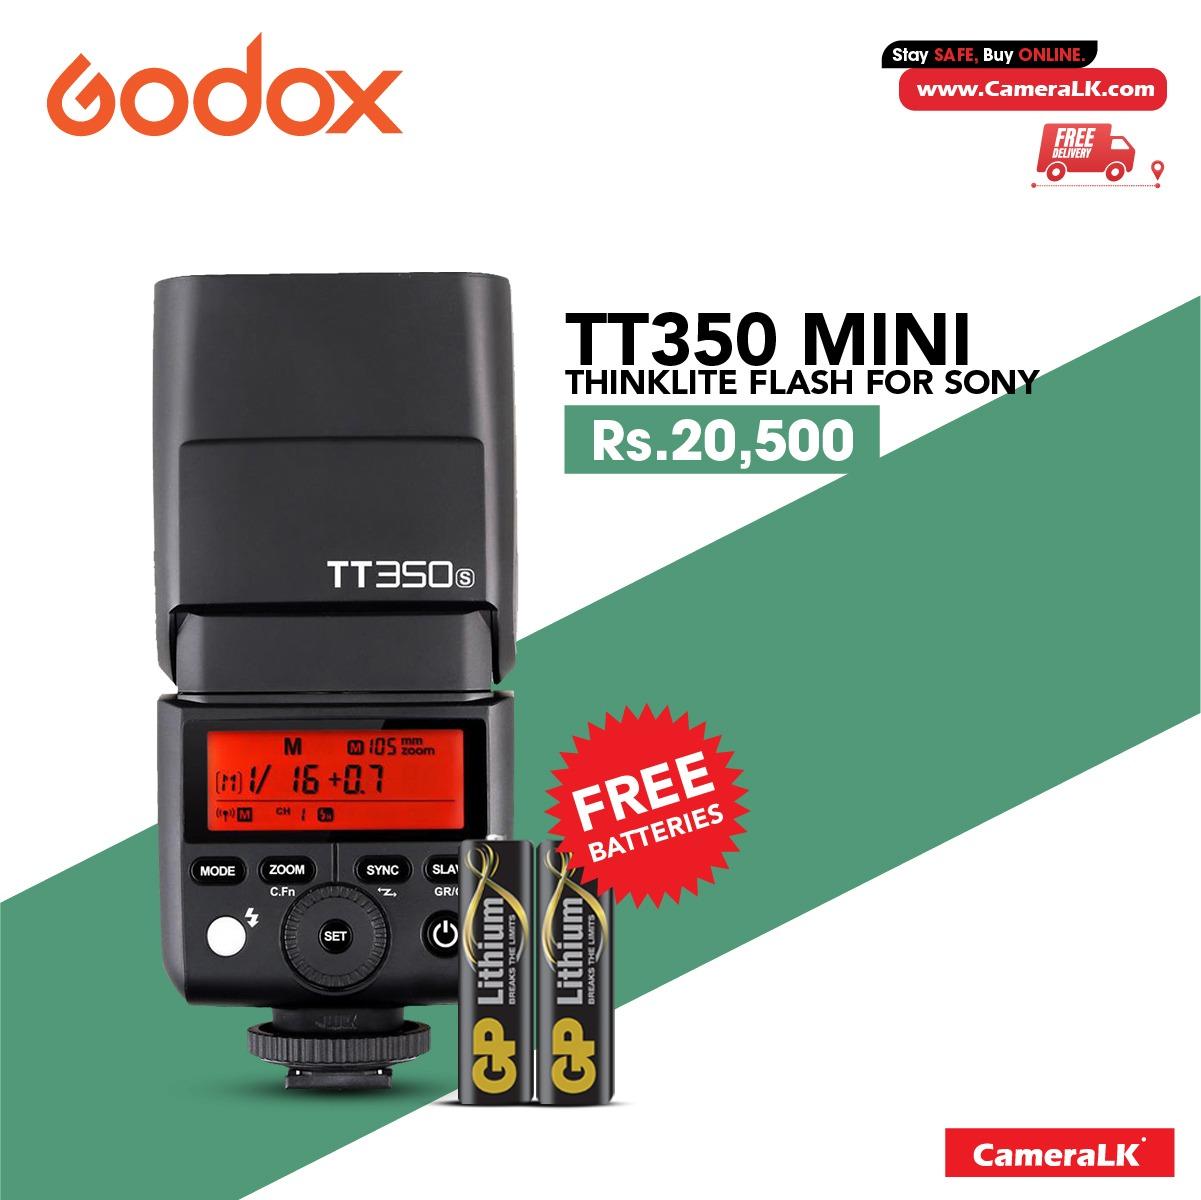 Godox TT350S Mini Thinklite TTL Flash for Sony Cameras